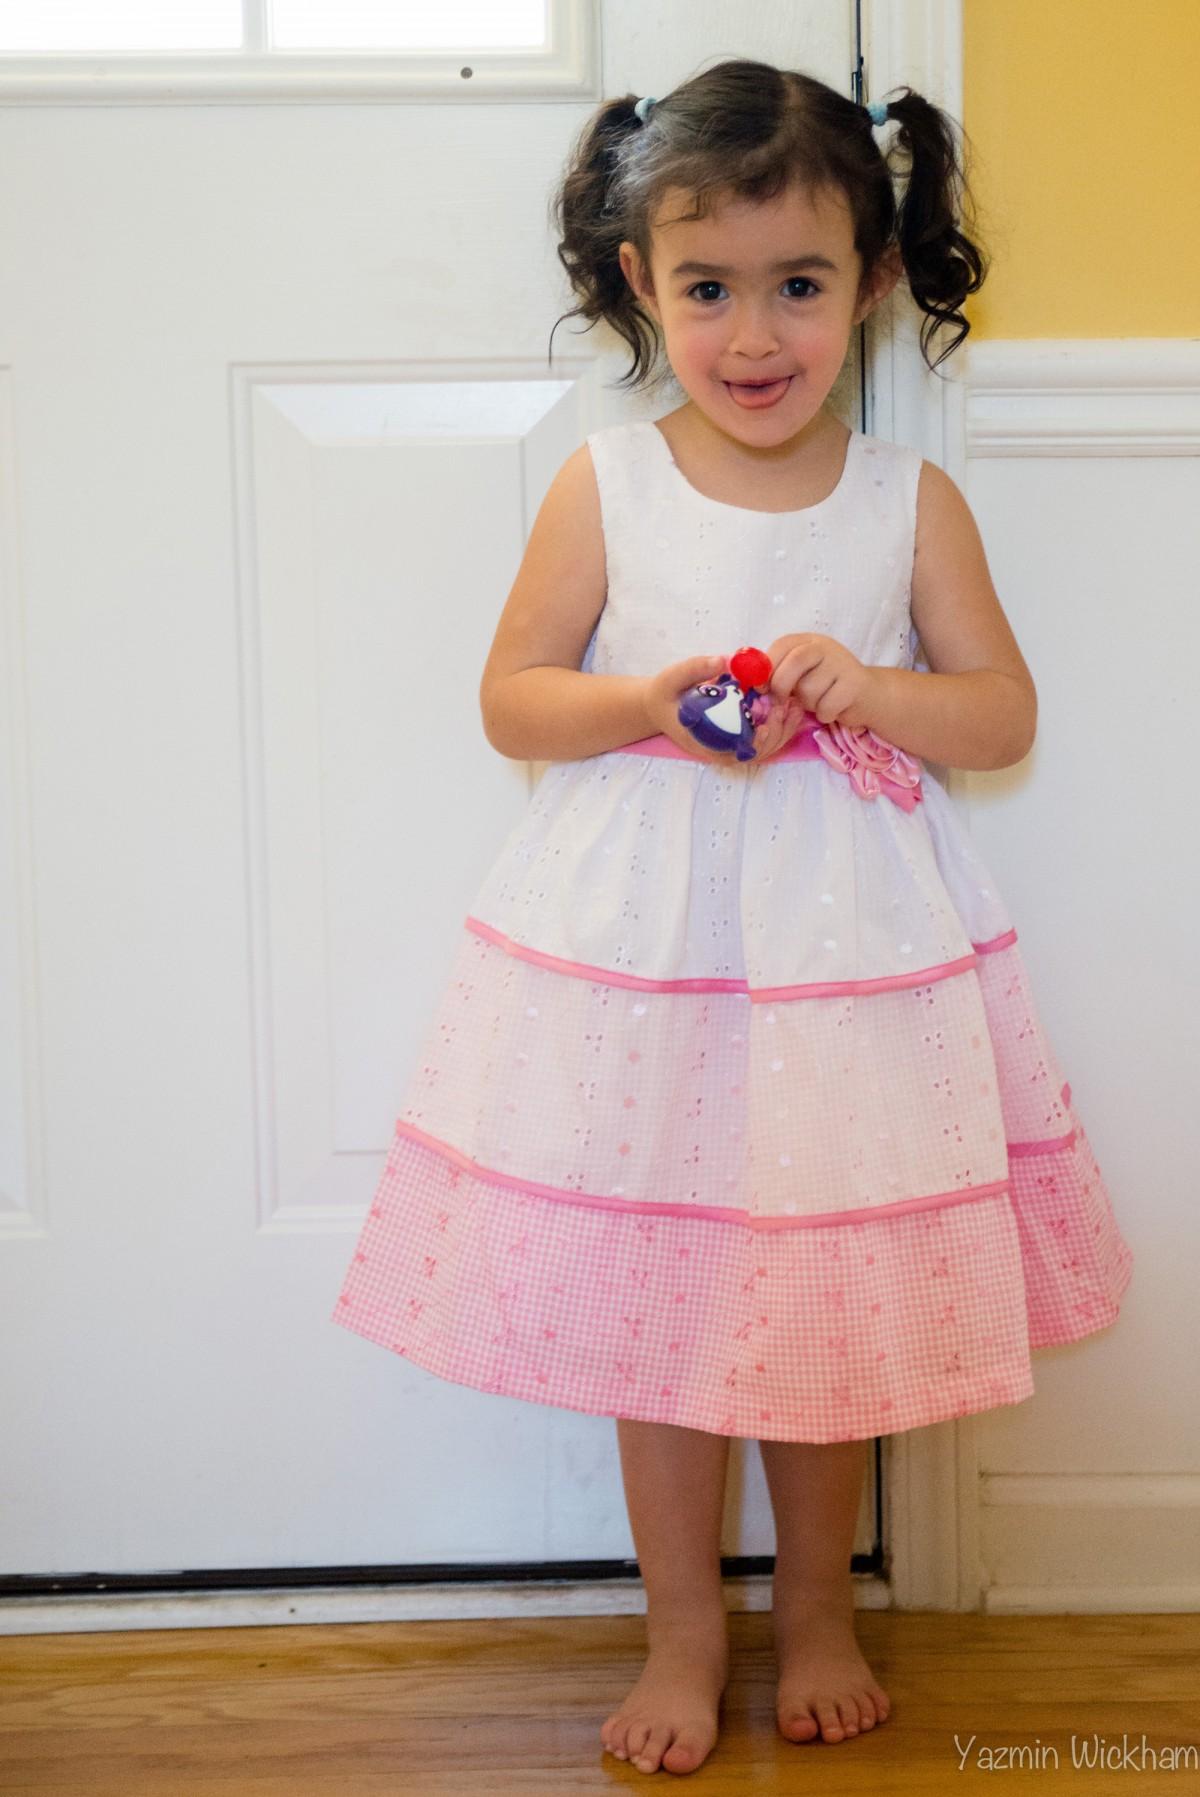 {135/365} Immediately modeling dress from nana